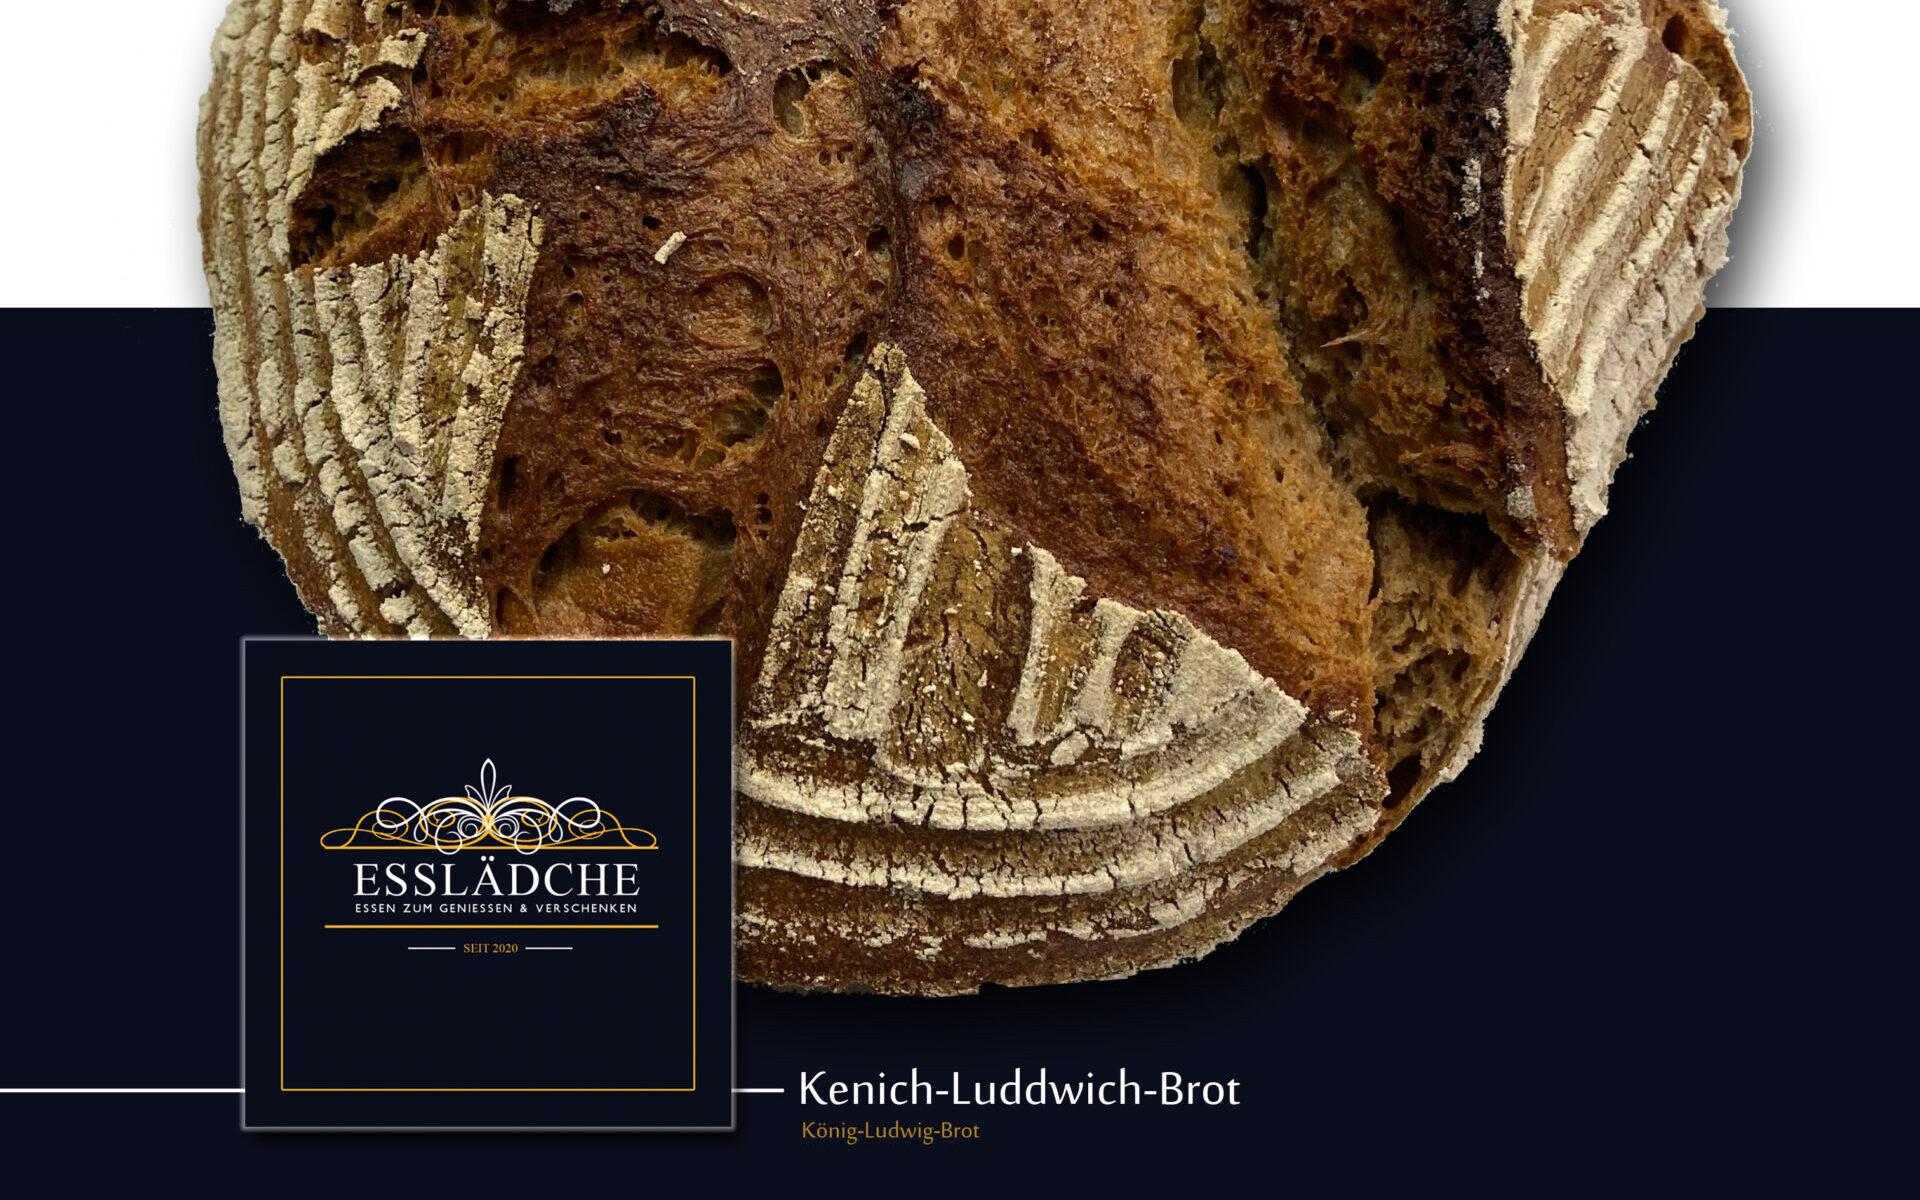 Brot mit Tradition